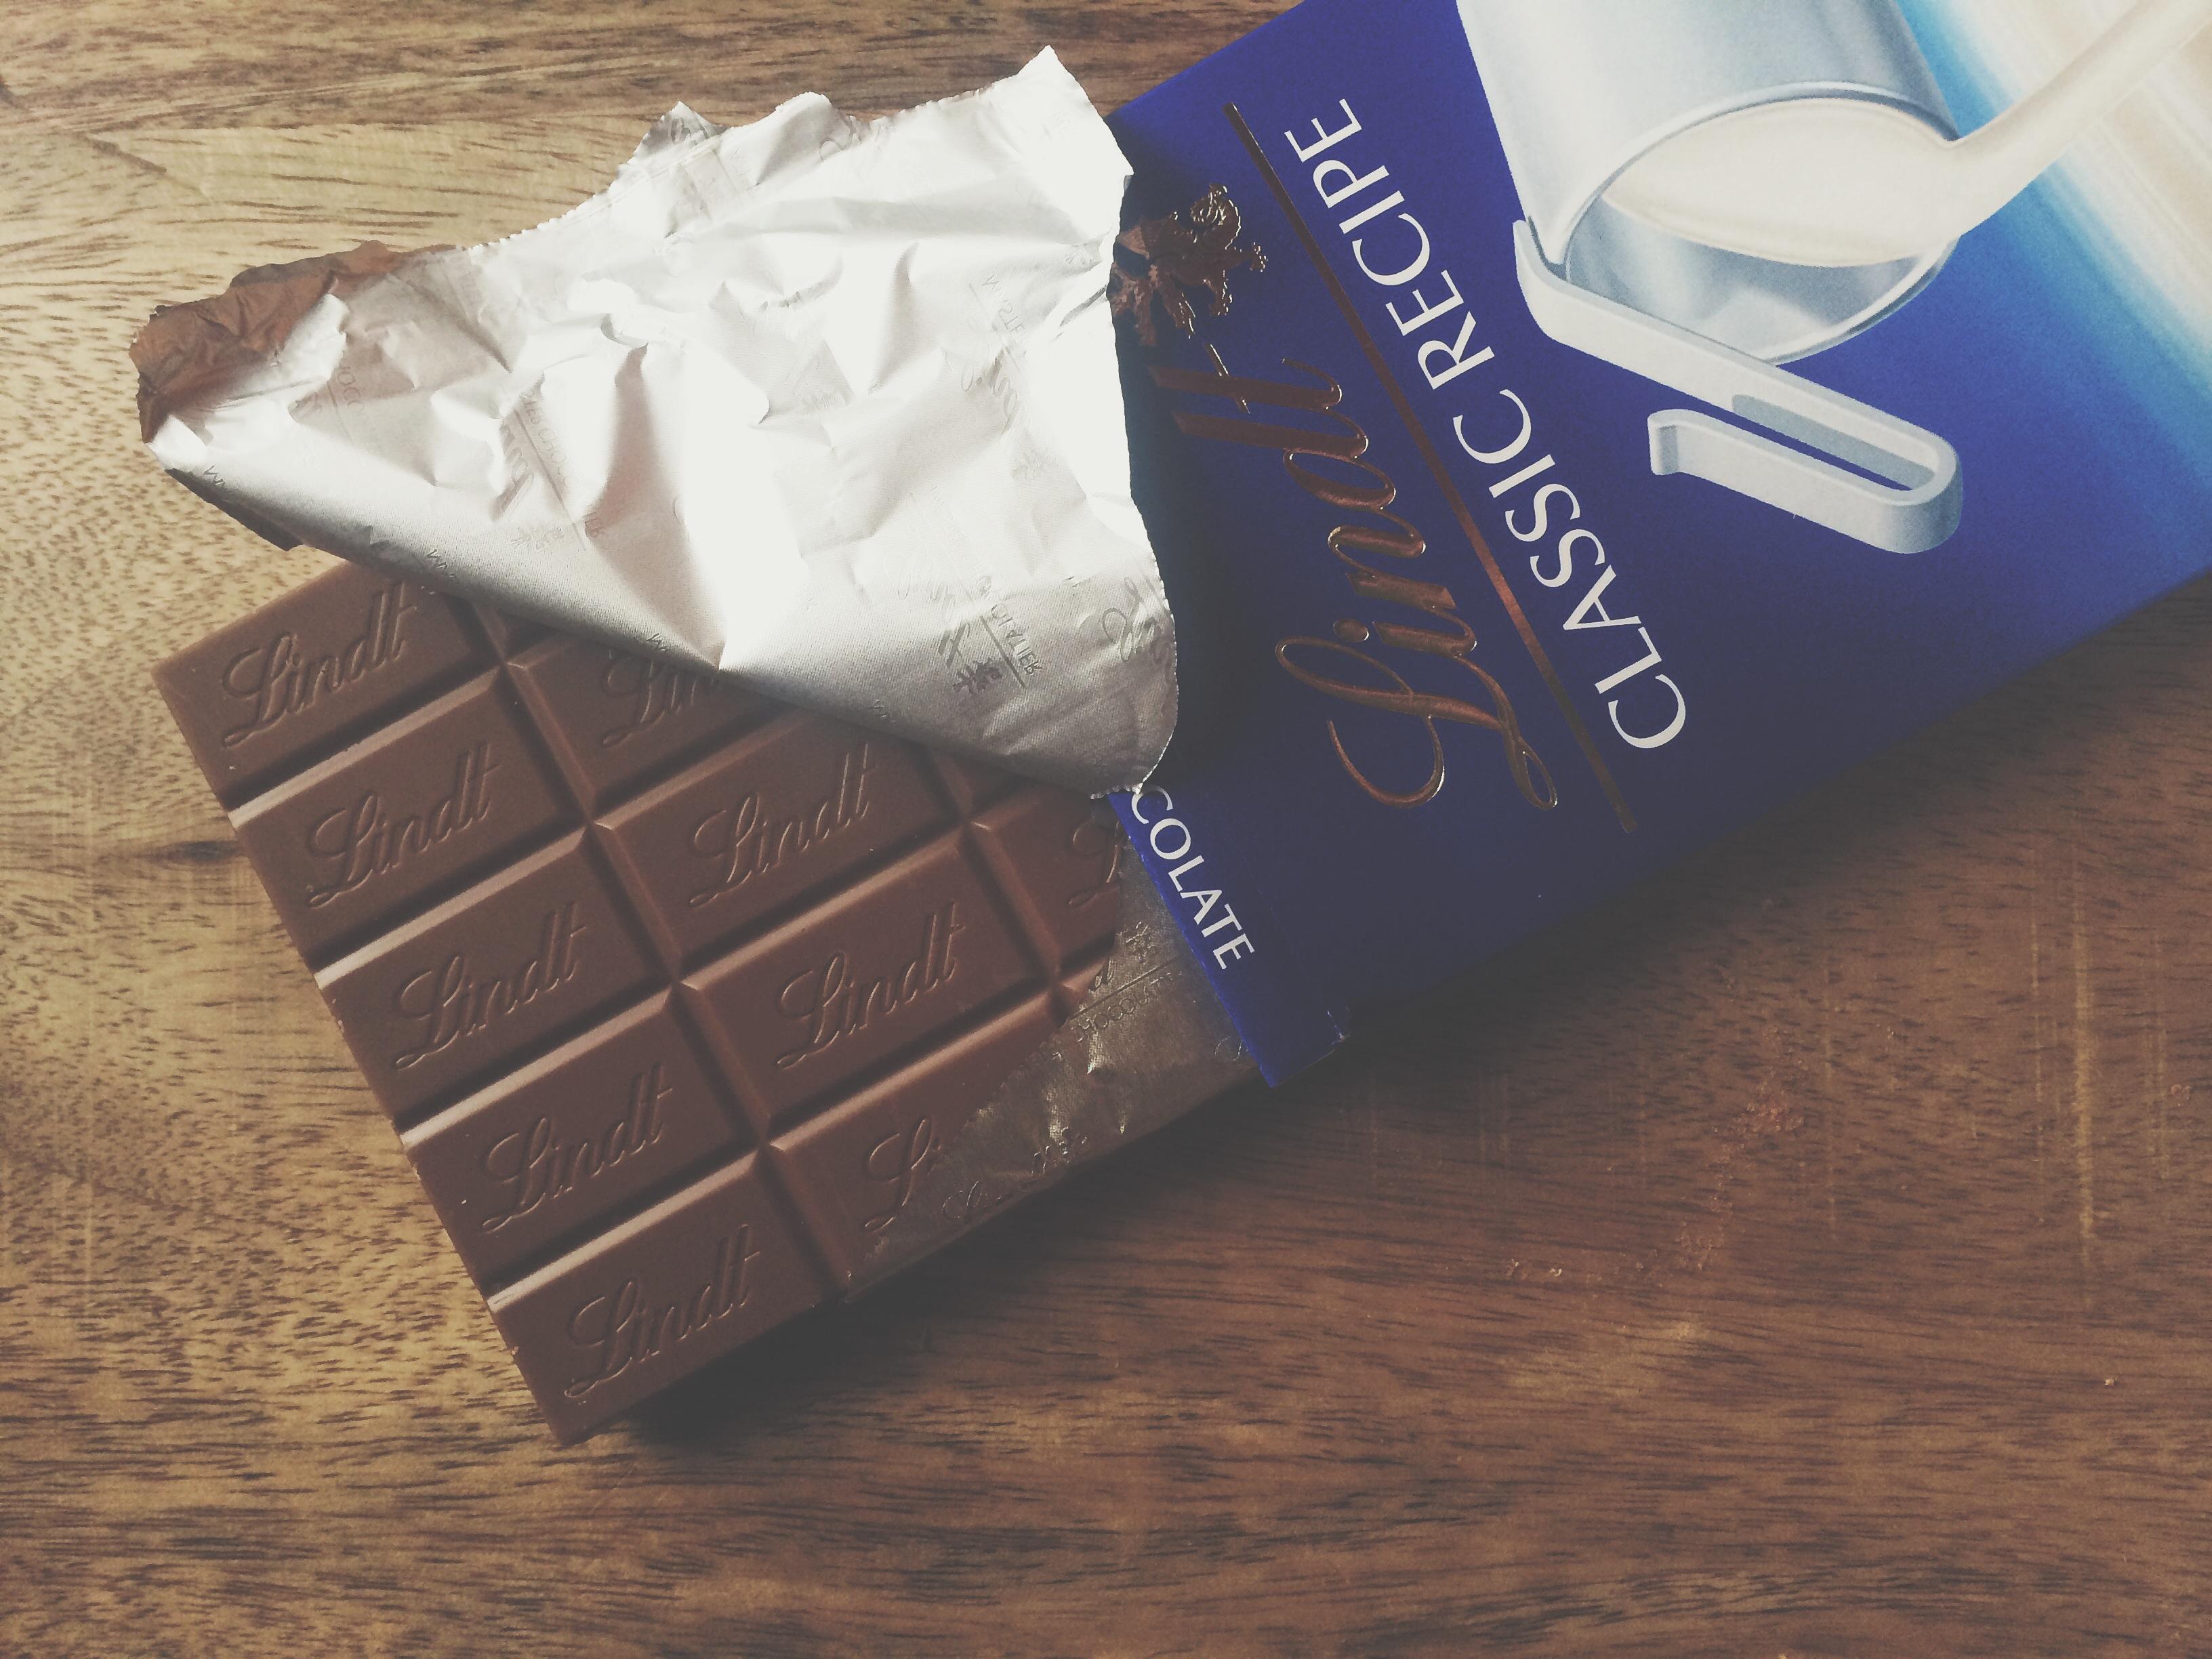 Mom's favorite is Lindt milk chocolate, so milk it was.